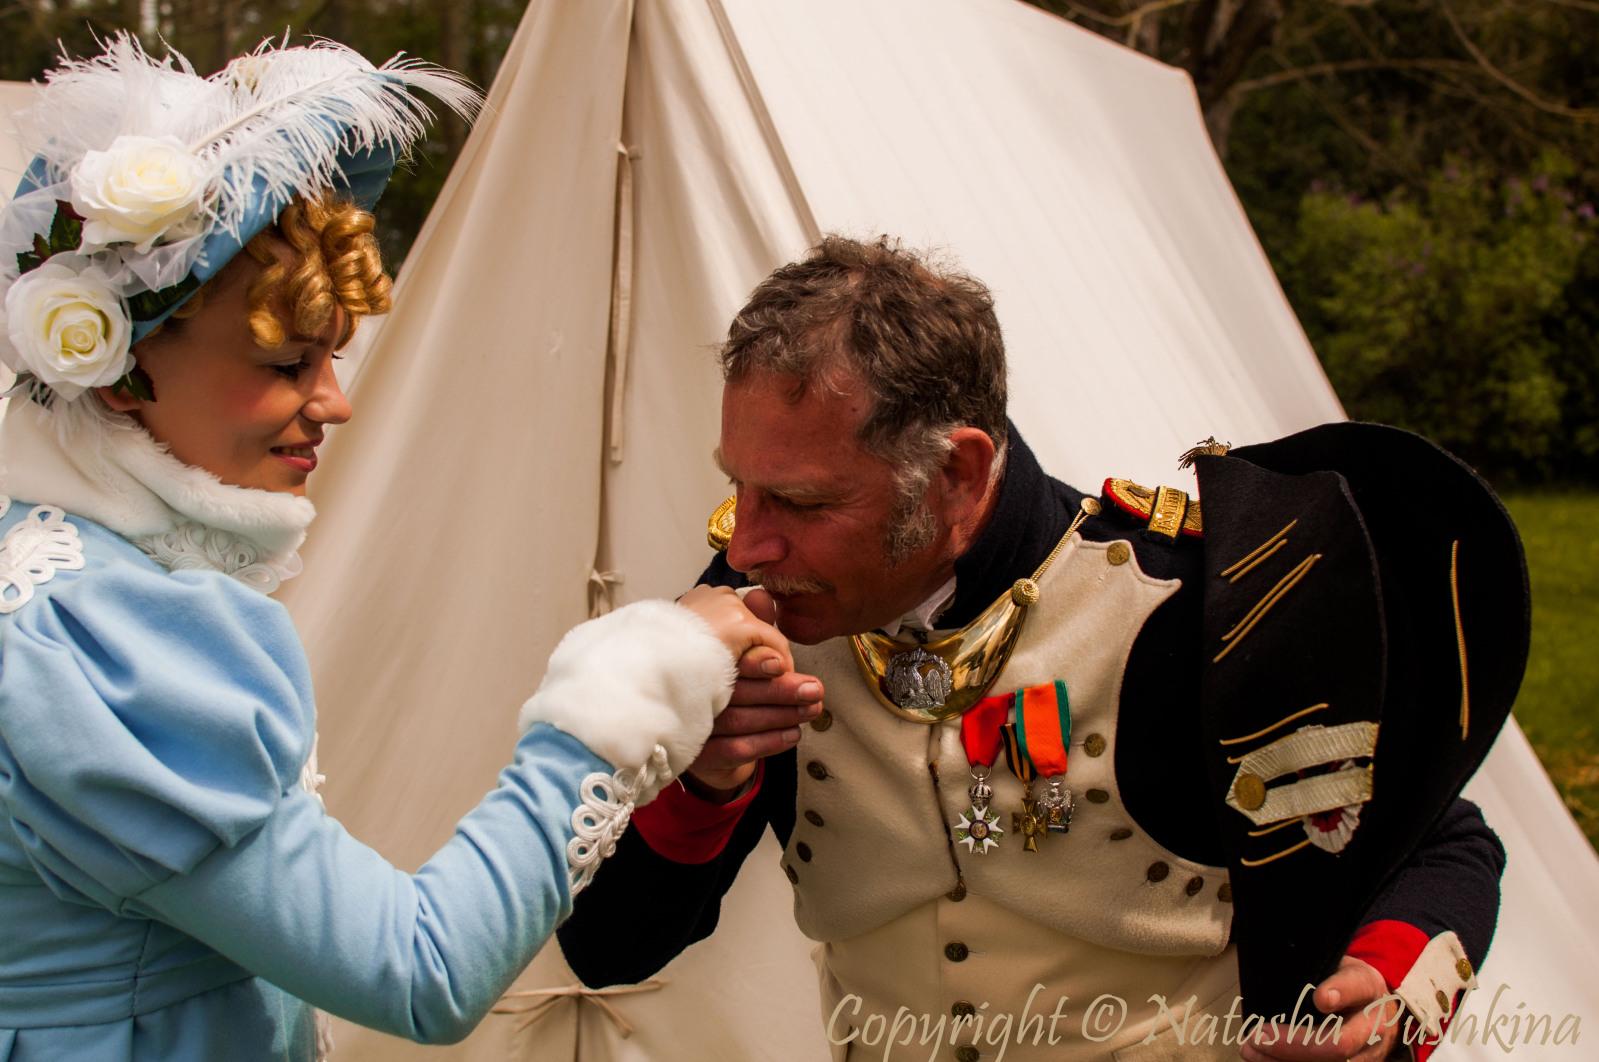 Francia - Fontainebleau (Ile de France) Recreación de la Despedida de Napoléon en 2014 24donbd